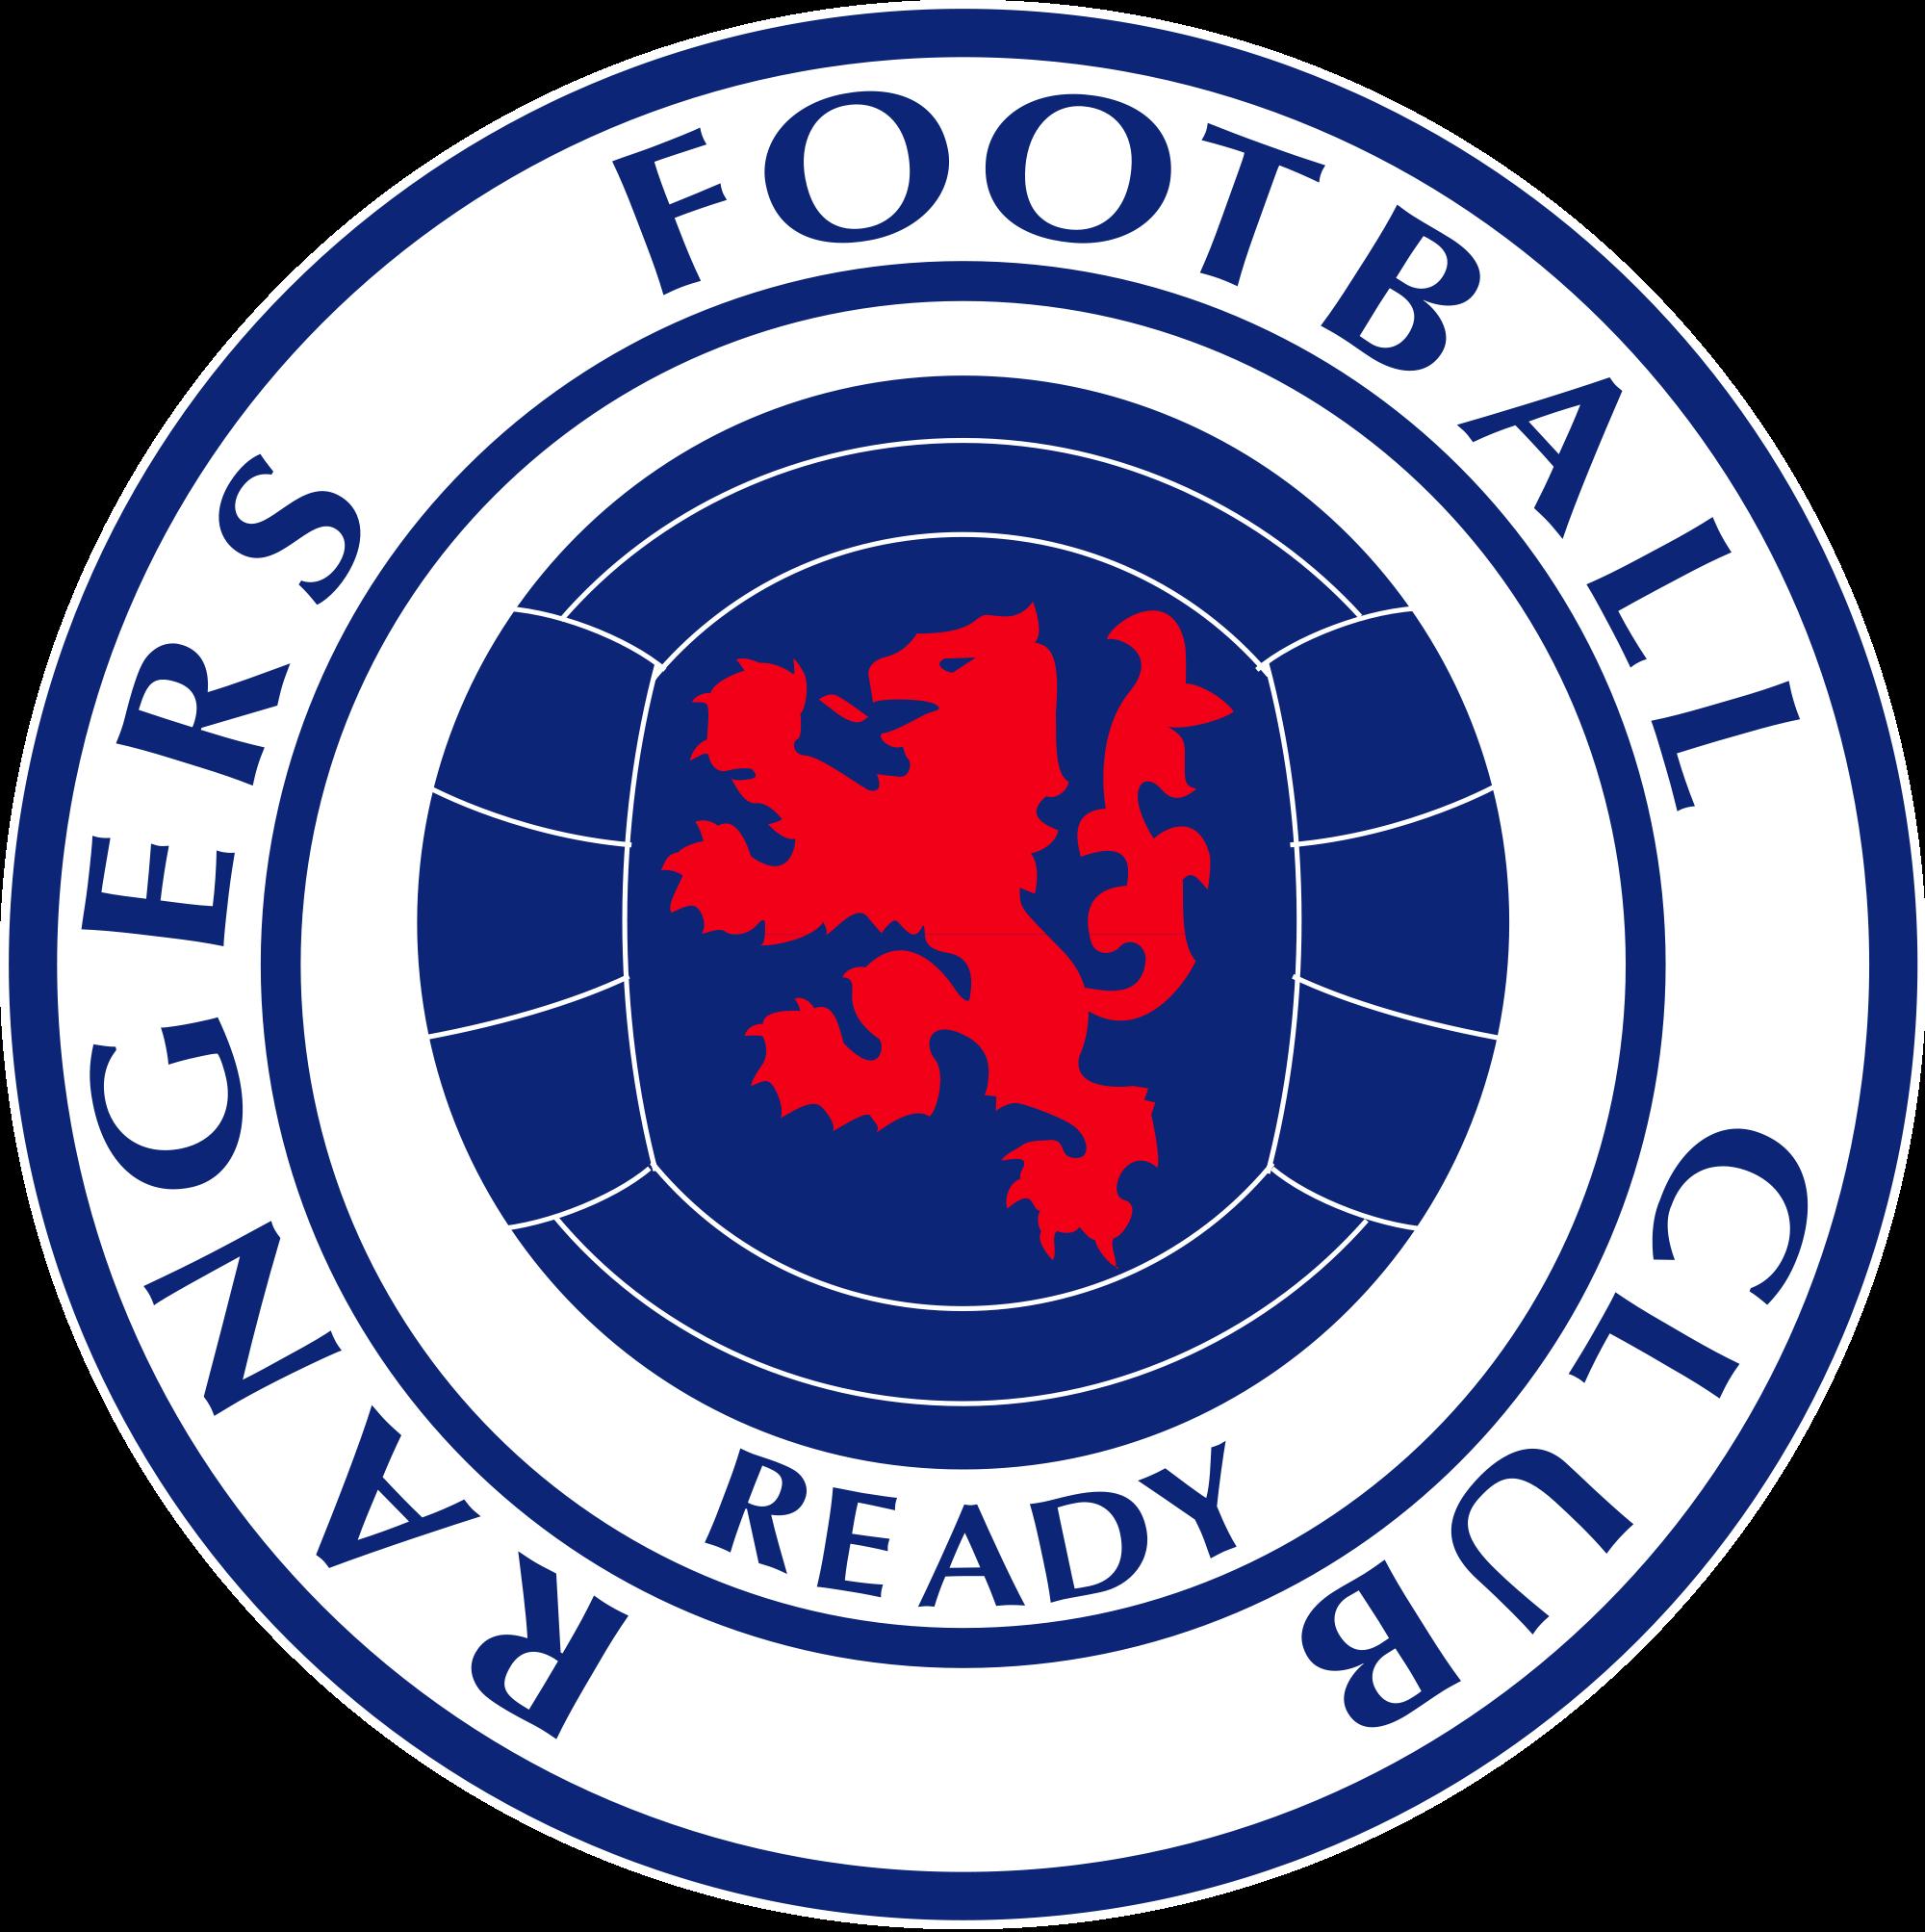 Rangers F.C. Glasgow rangers football, Glasgow rangers